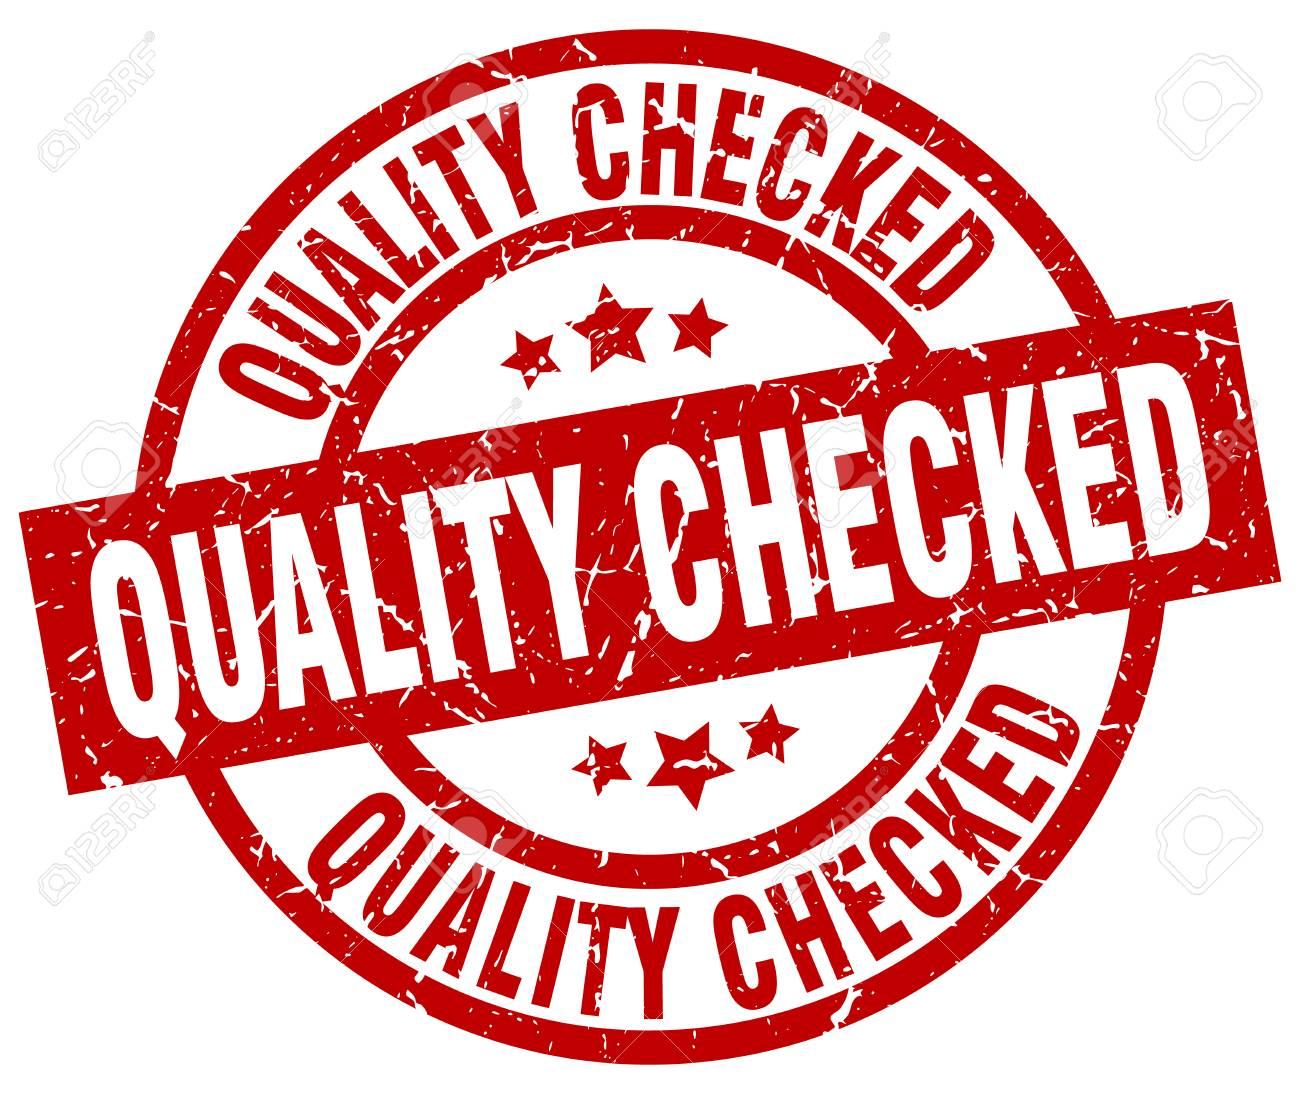 76420935-quality-checked-round-red-grunge-stamp.jpg